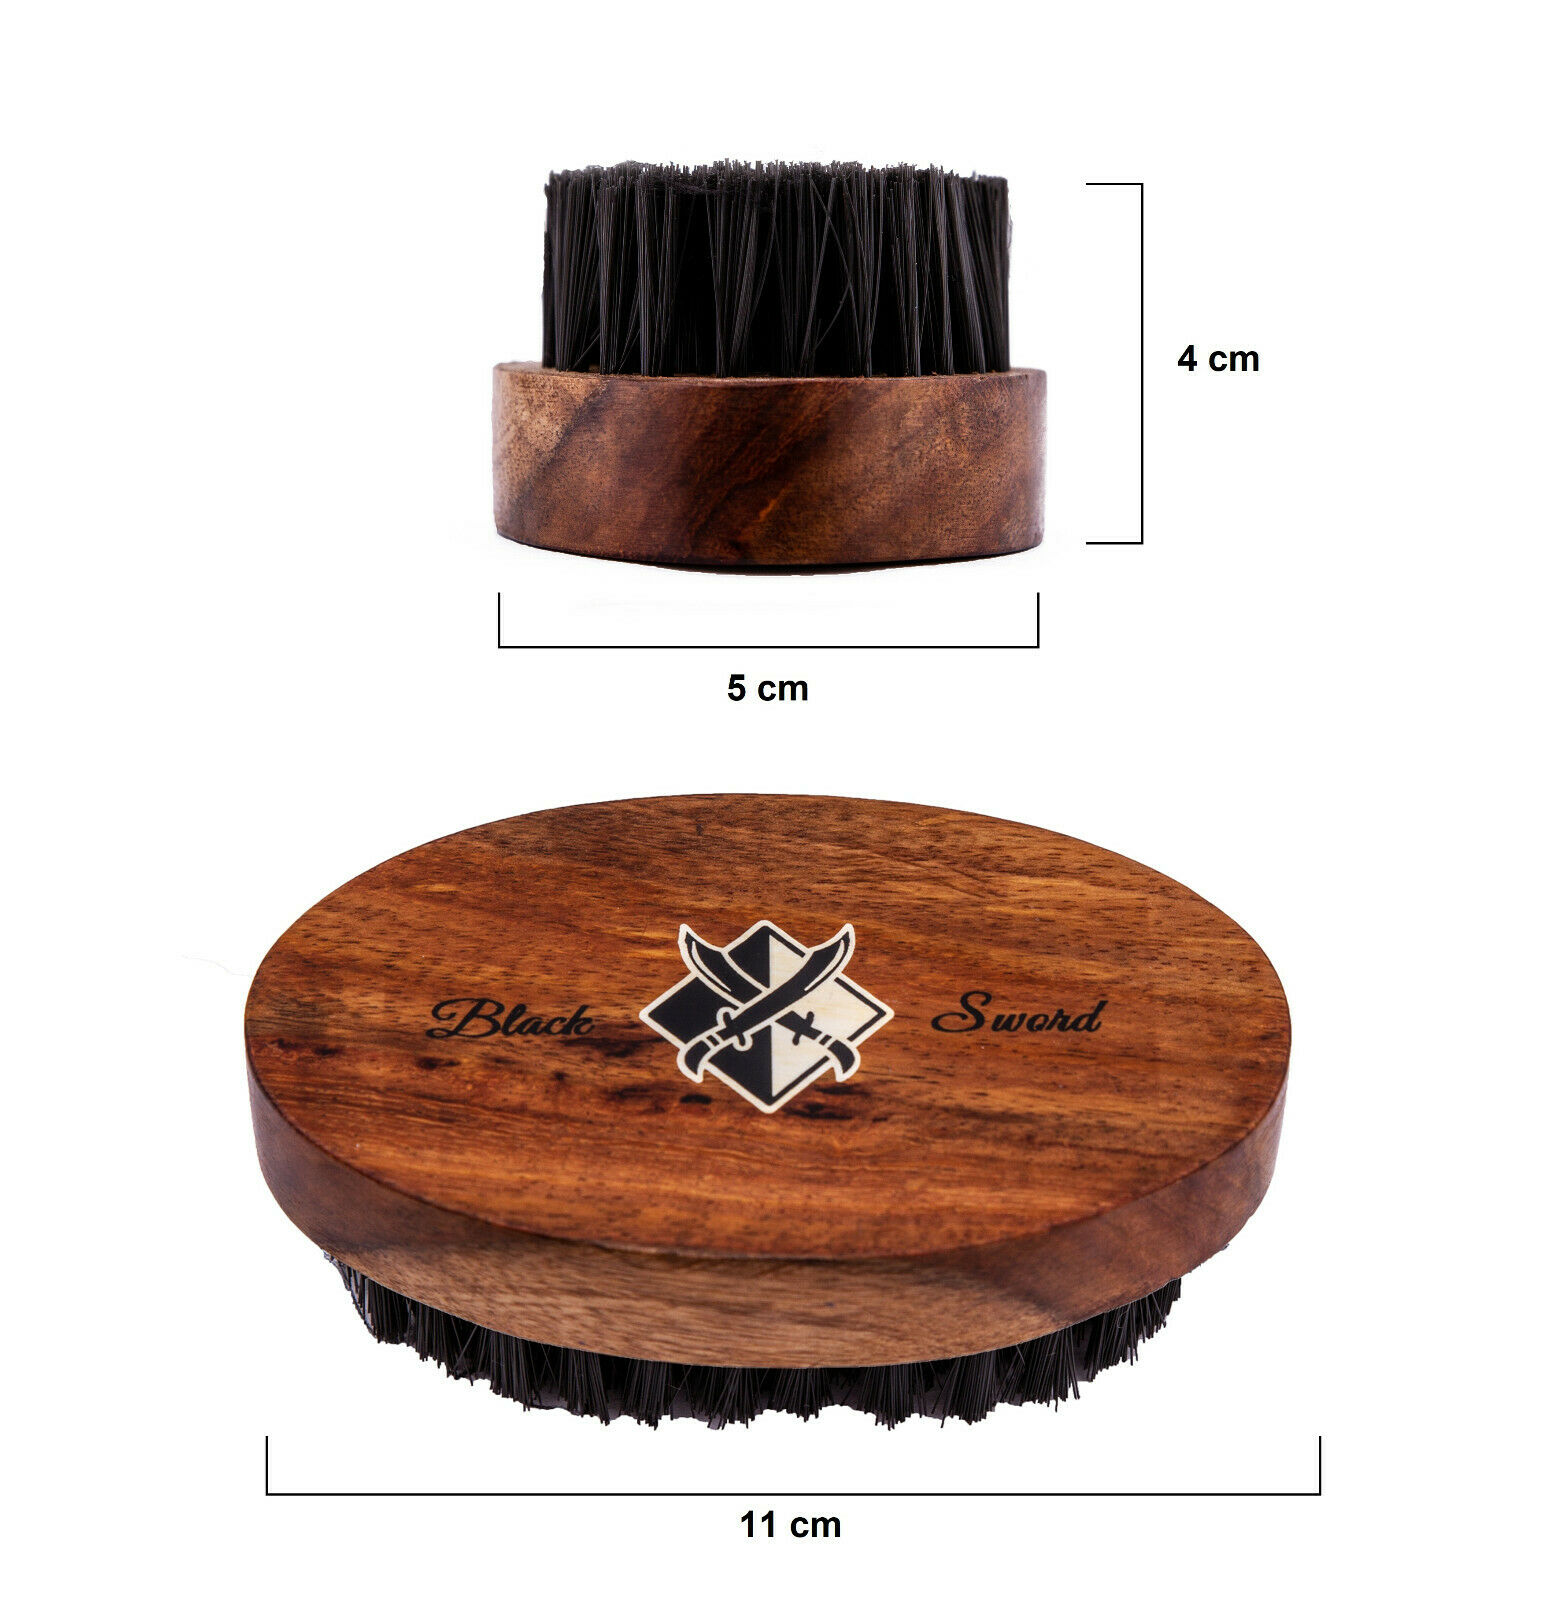 BlackSword Bartbürste | Haarbürste | Bürste | Barbierbürste | groß